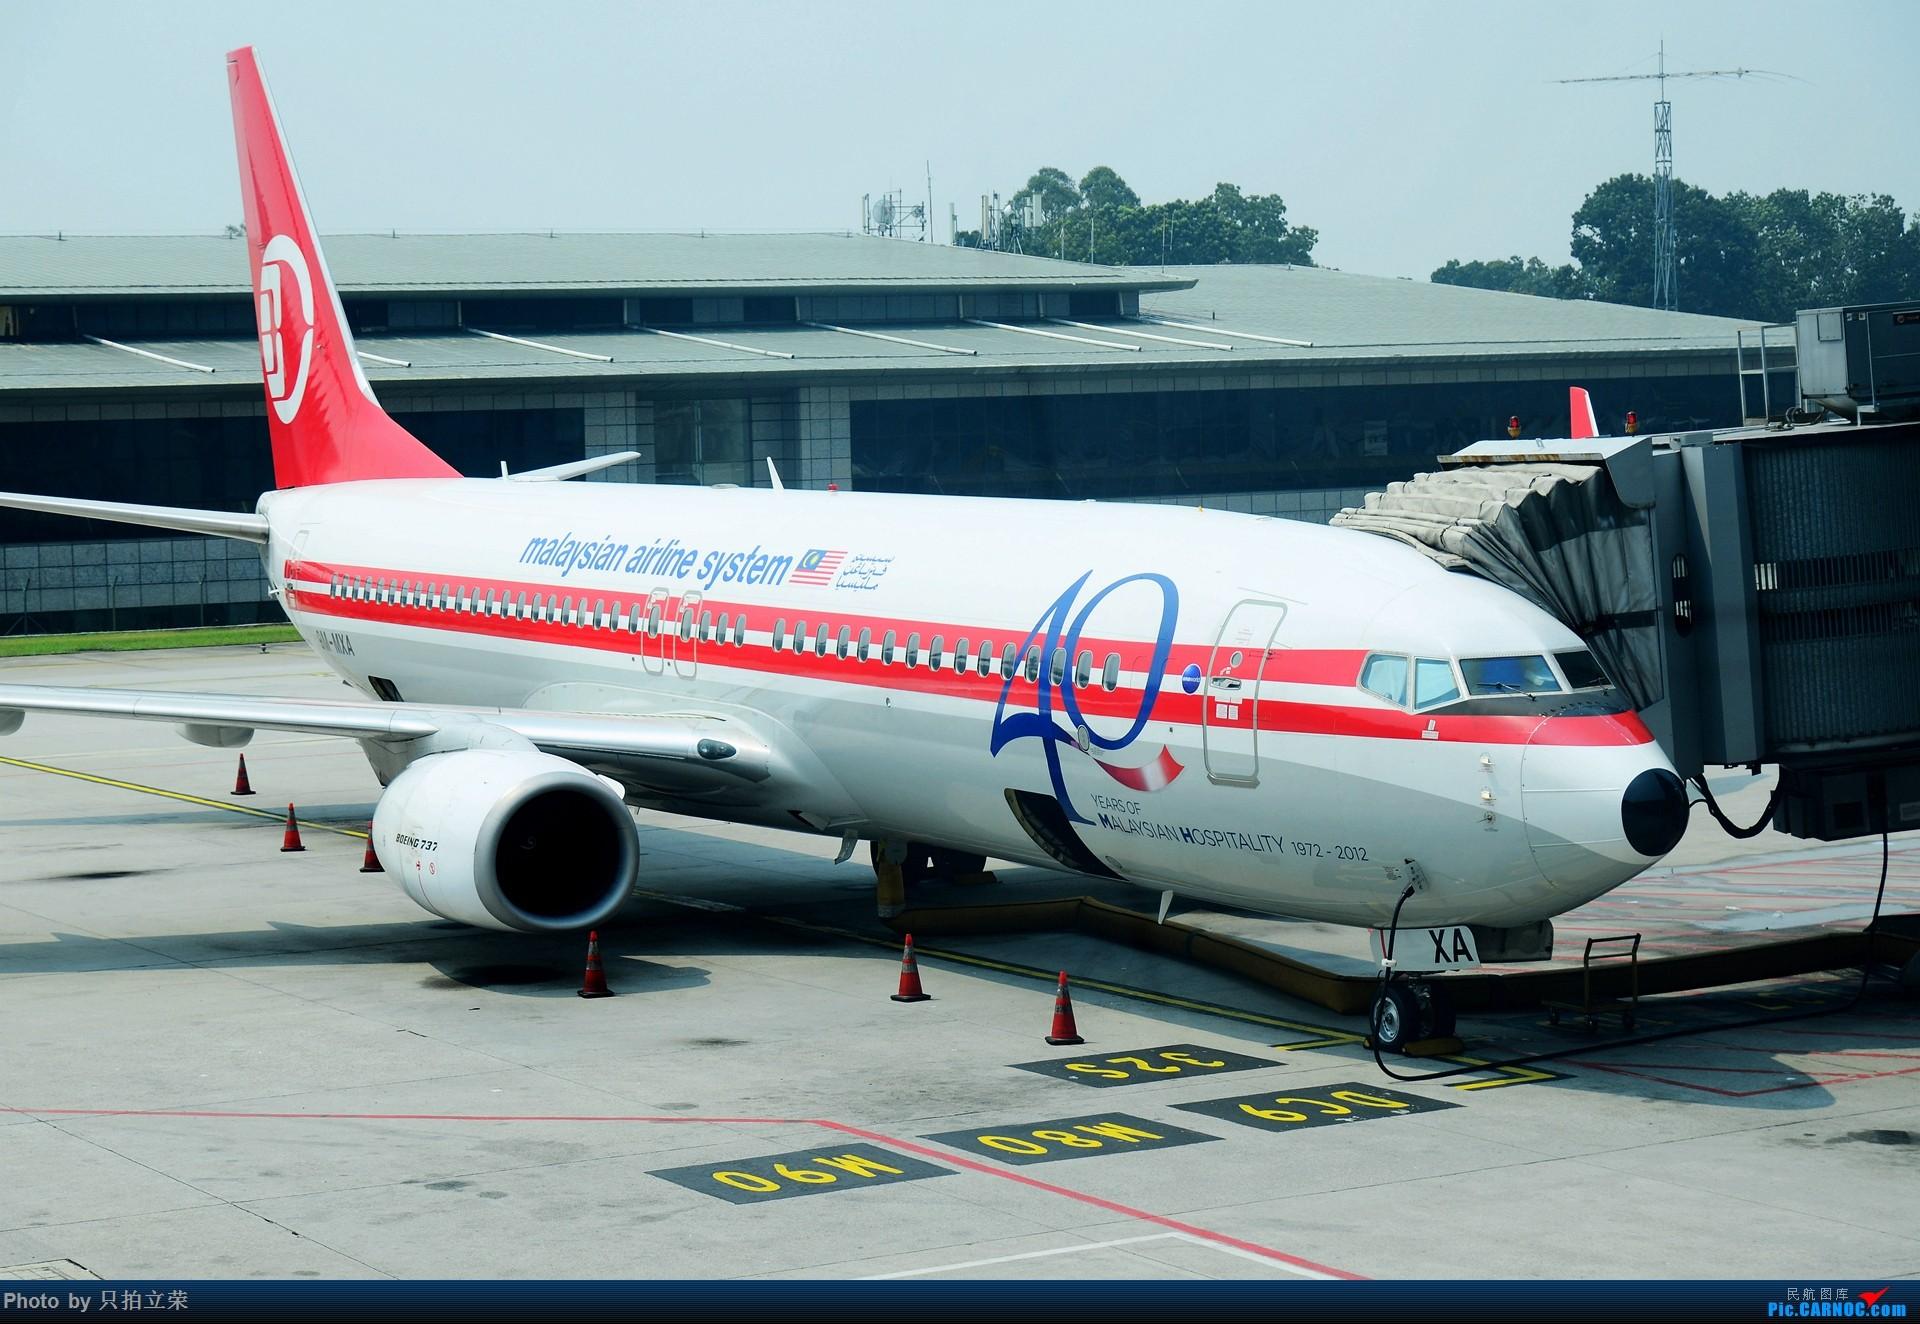 Re:[原创]湖南飞友会:只拍立荣回归。马来之旅航站楼杂图一堆。 BOEING 737-800 9M-MXA 马来西亚吉隆坡国际机场